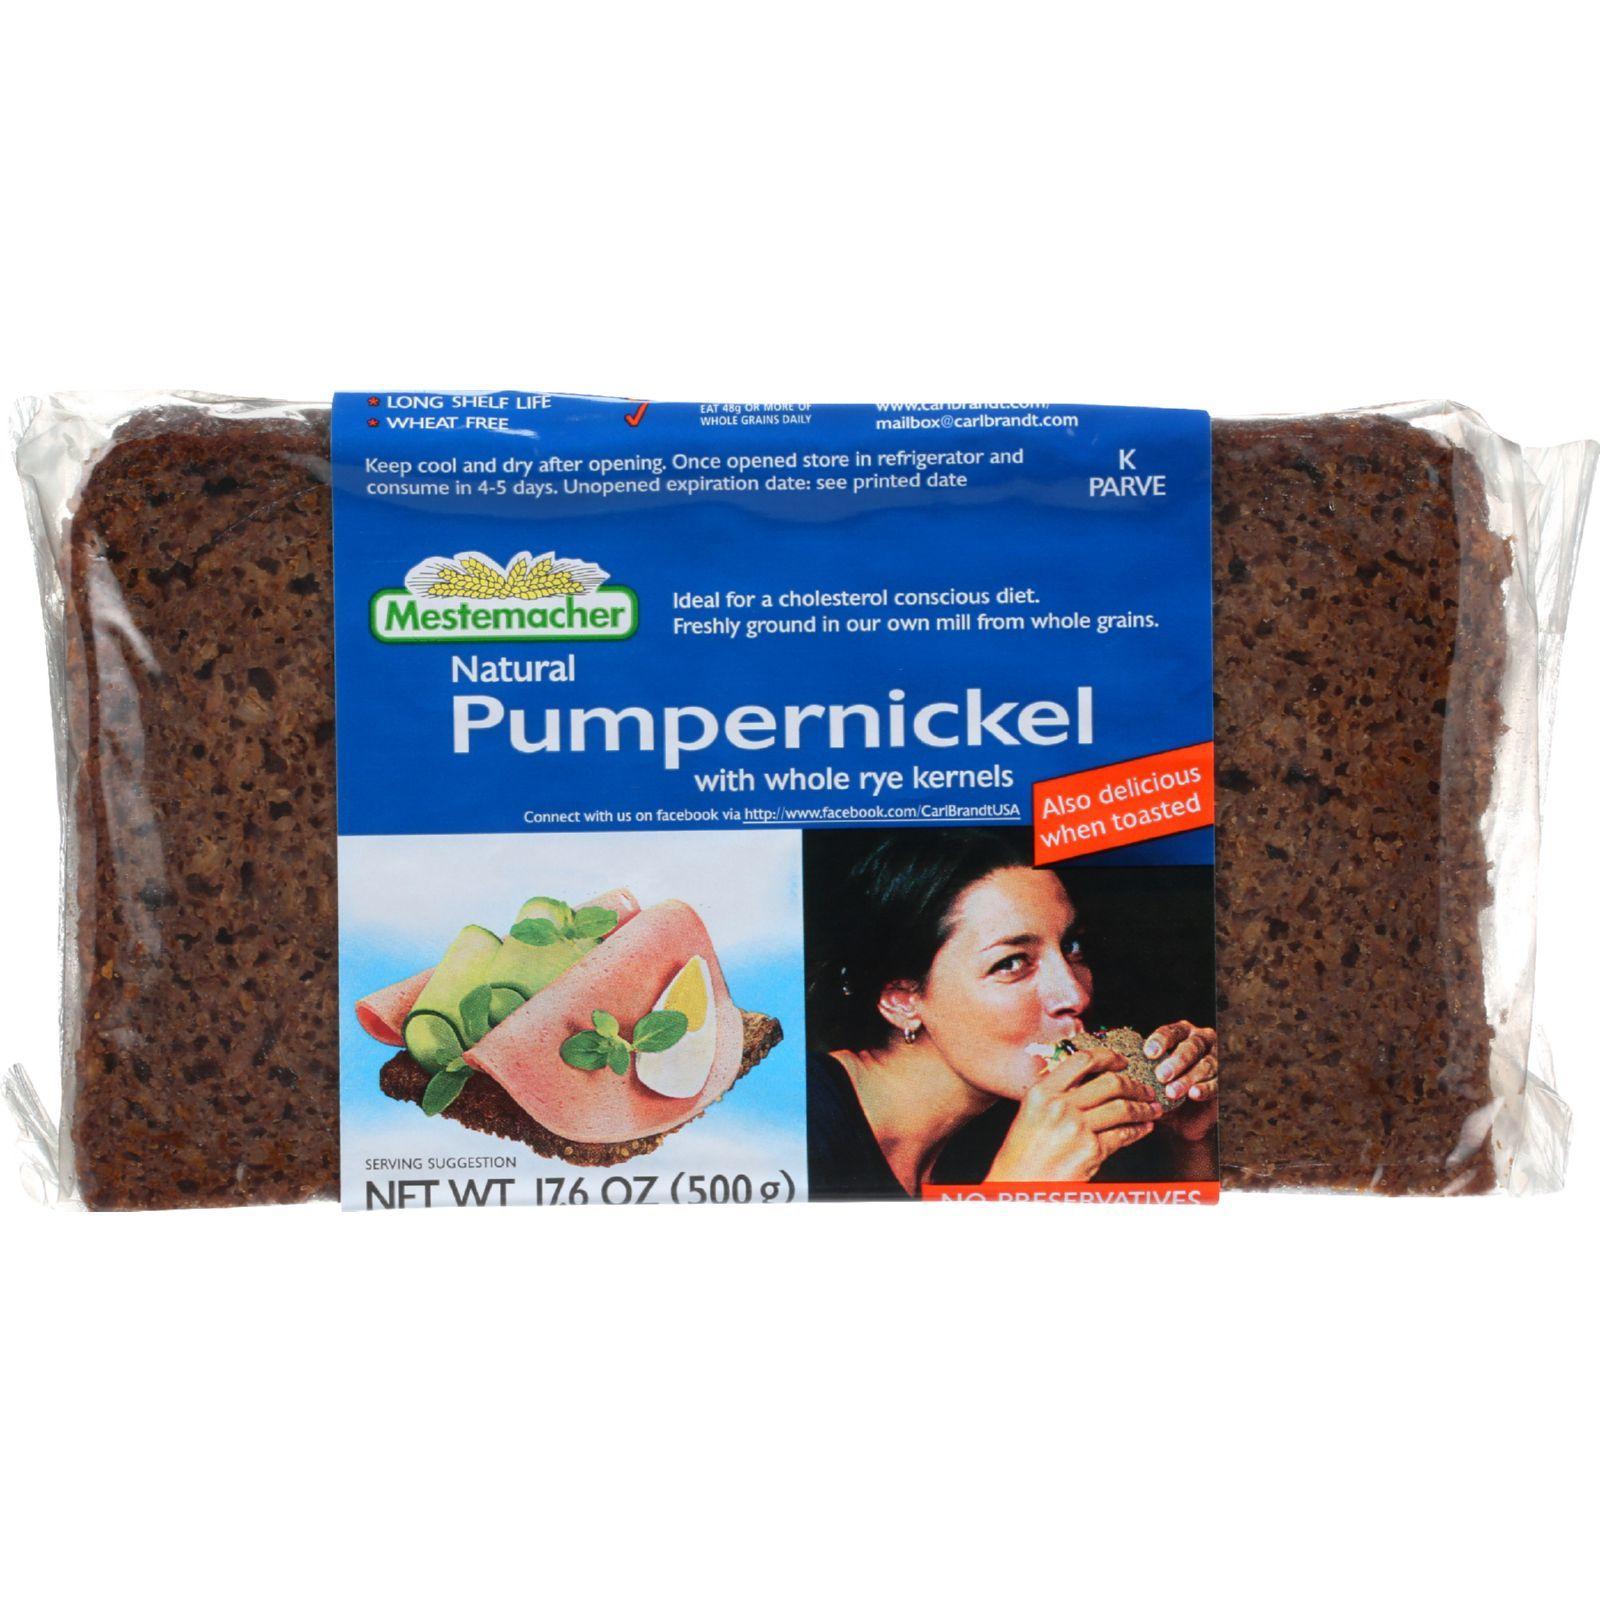 Mestemacher Bread Bread - Westphalian Classic - Pumpernickel - 17.6 oz - 1 each